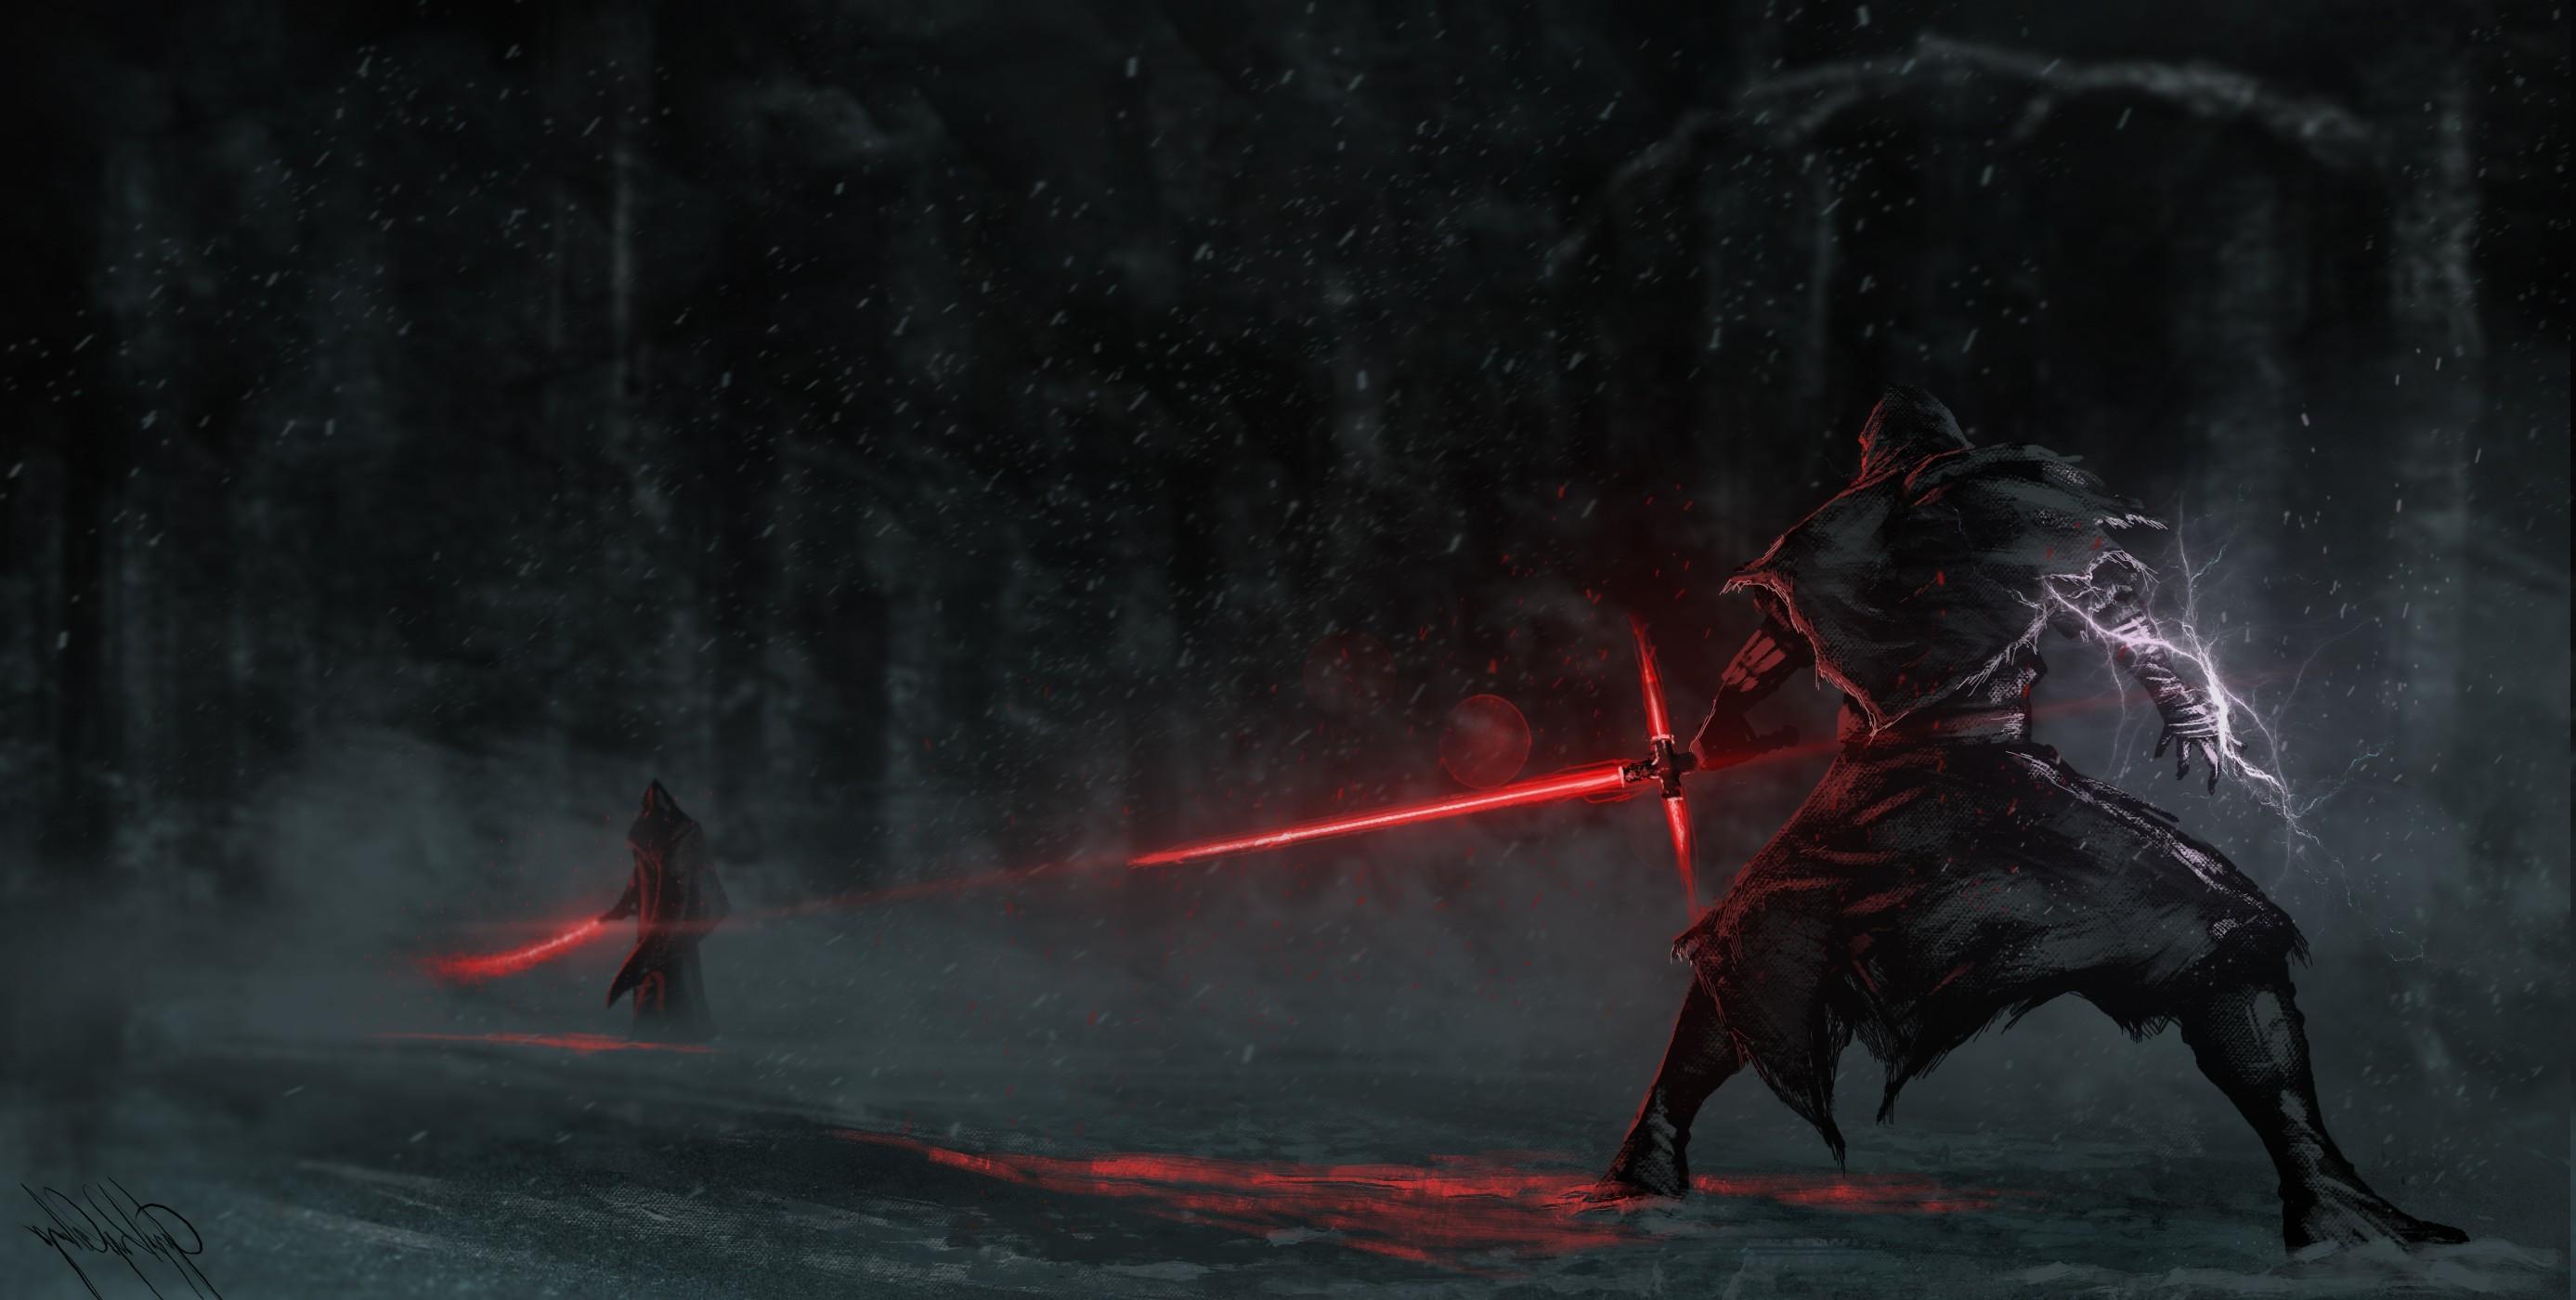 Star Wars: Episode VII The Force Awakens, Tsaber, Red, Artwork, Skyrace,  Sword, Star Wars Wallpapers HD / Desktop and Mobile Backgrounds